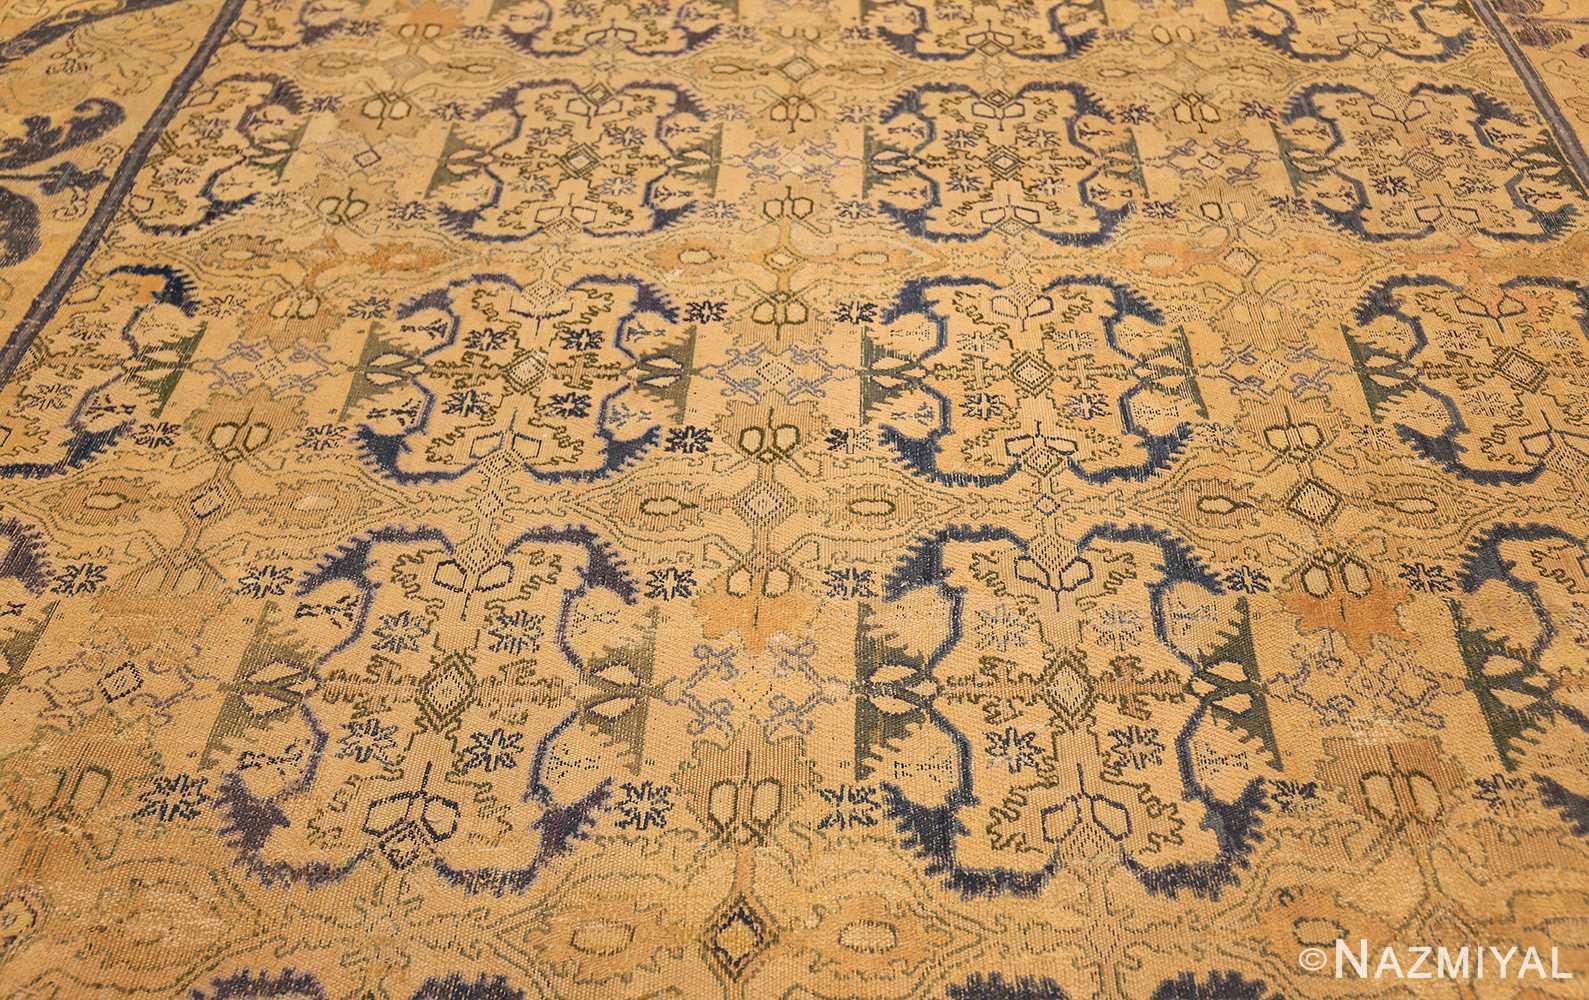 17th century cuenca spanish rug 49270 middle Nazmiyal